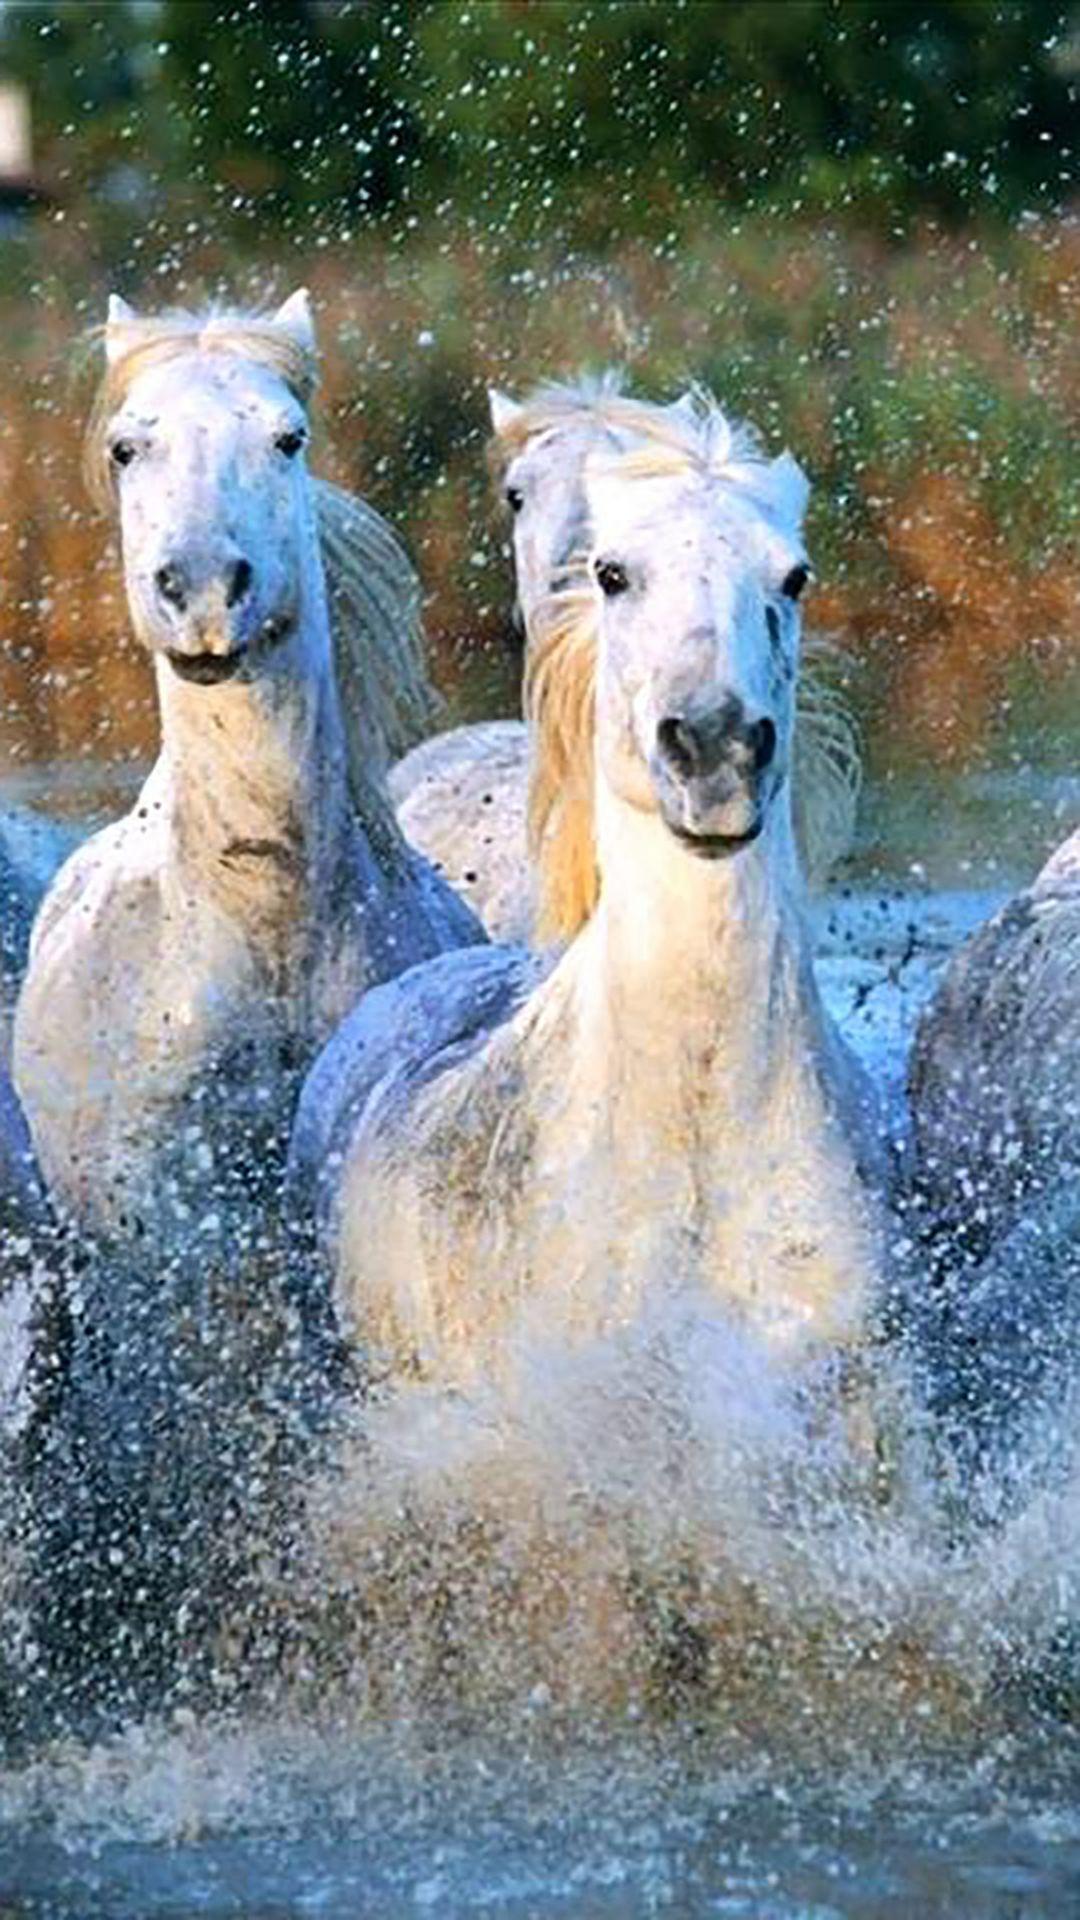 Amazing Wallpaper Horse Watercolor - 6185cb596124923fc29da27bb5882b1c  Perfect Image Reference_236013.jpg